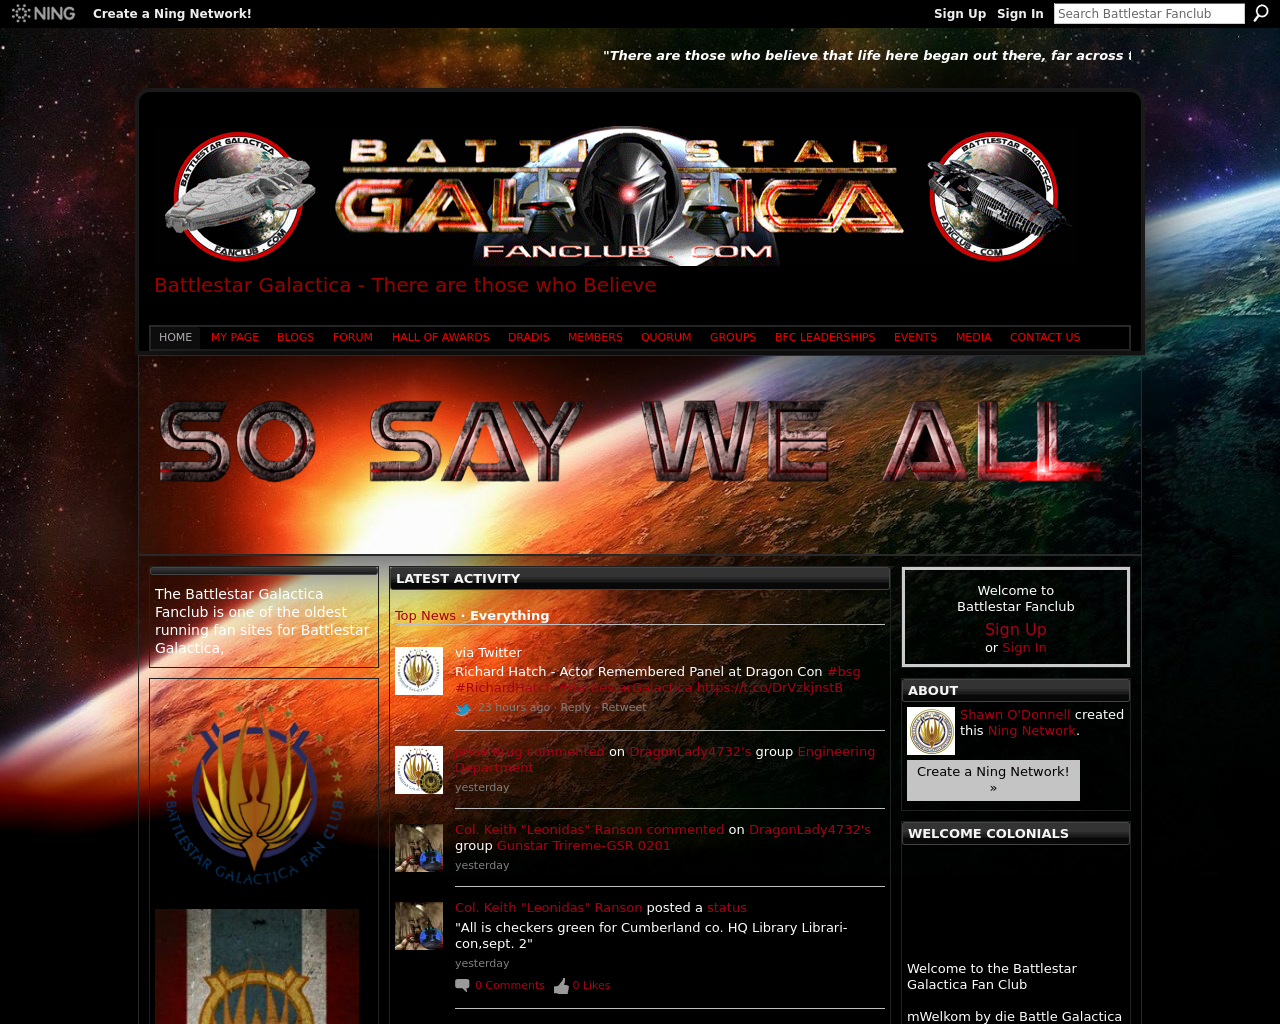 BATTLESTAR-GALACTICA-Advertising-Reviews-Pricing